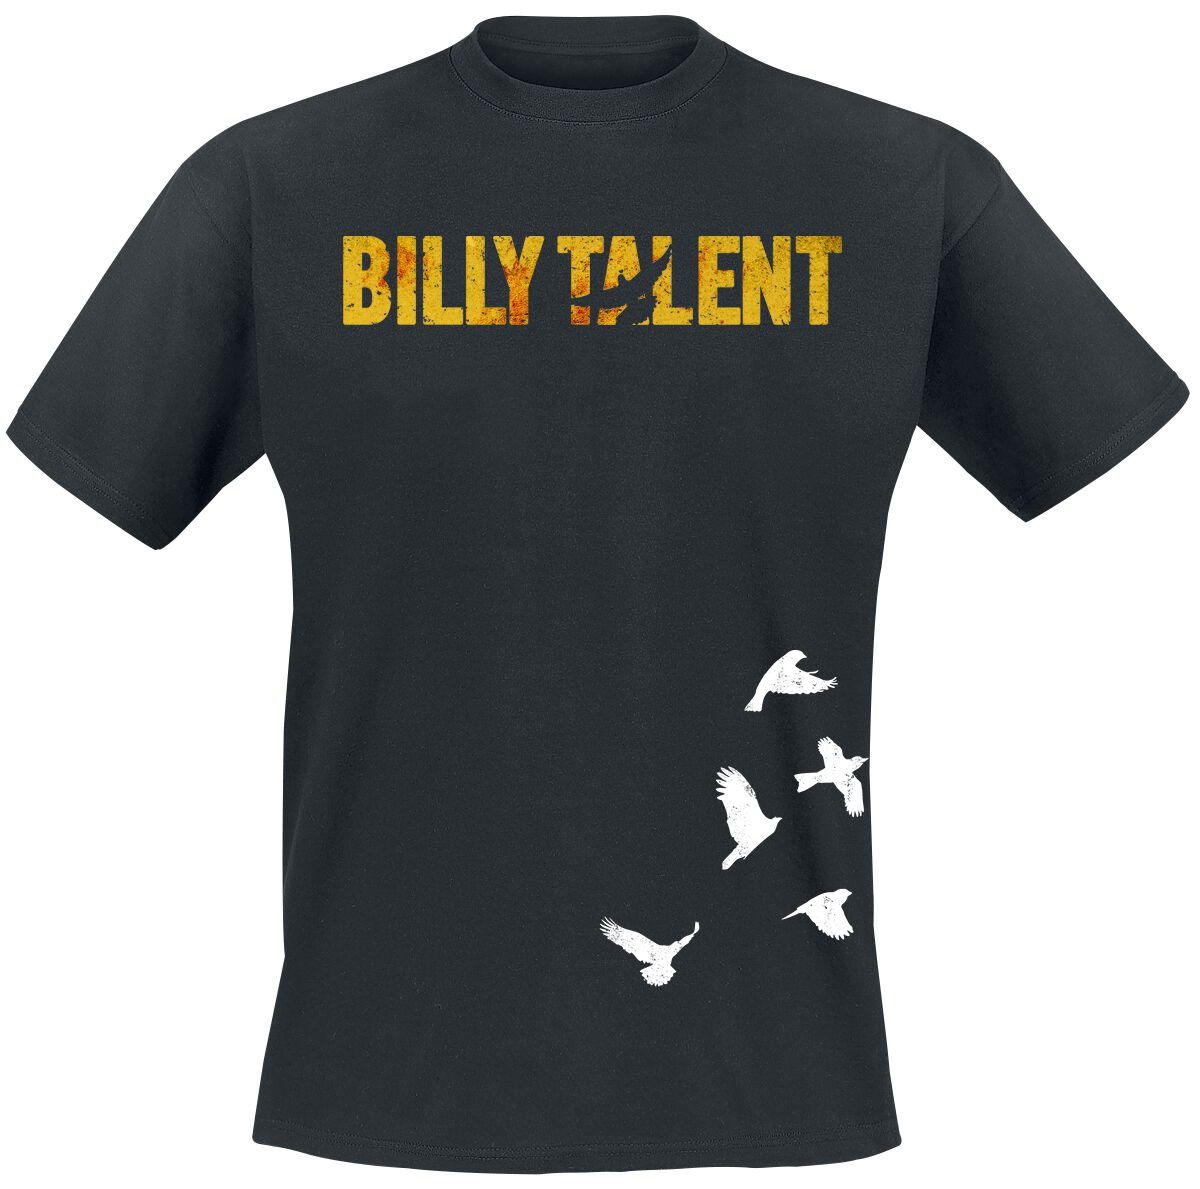 Zespoły - Koszulki - T-Shirt Billy Talent Birds T-Shirt czarny - 338781